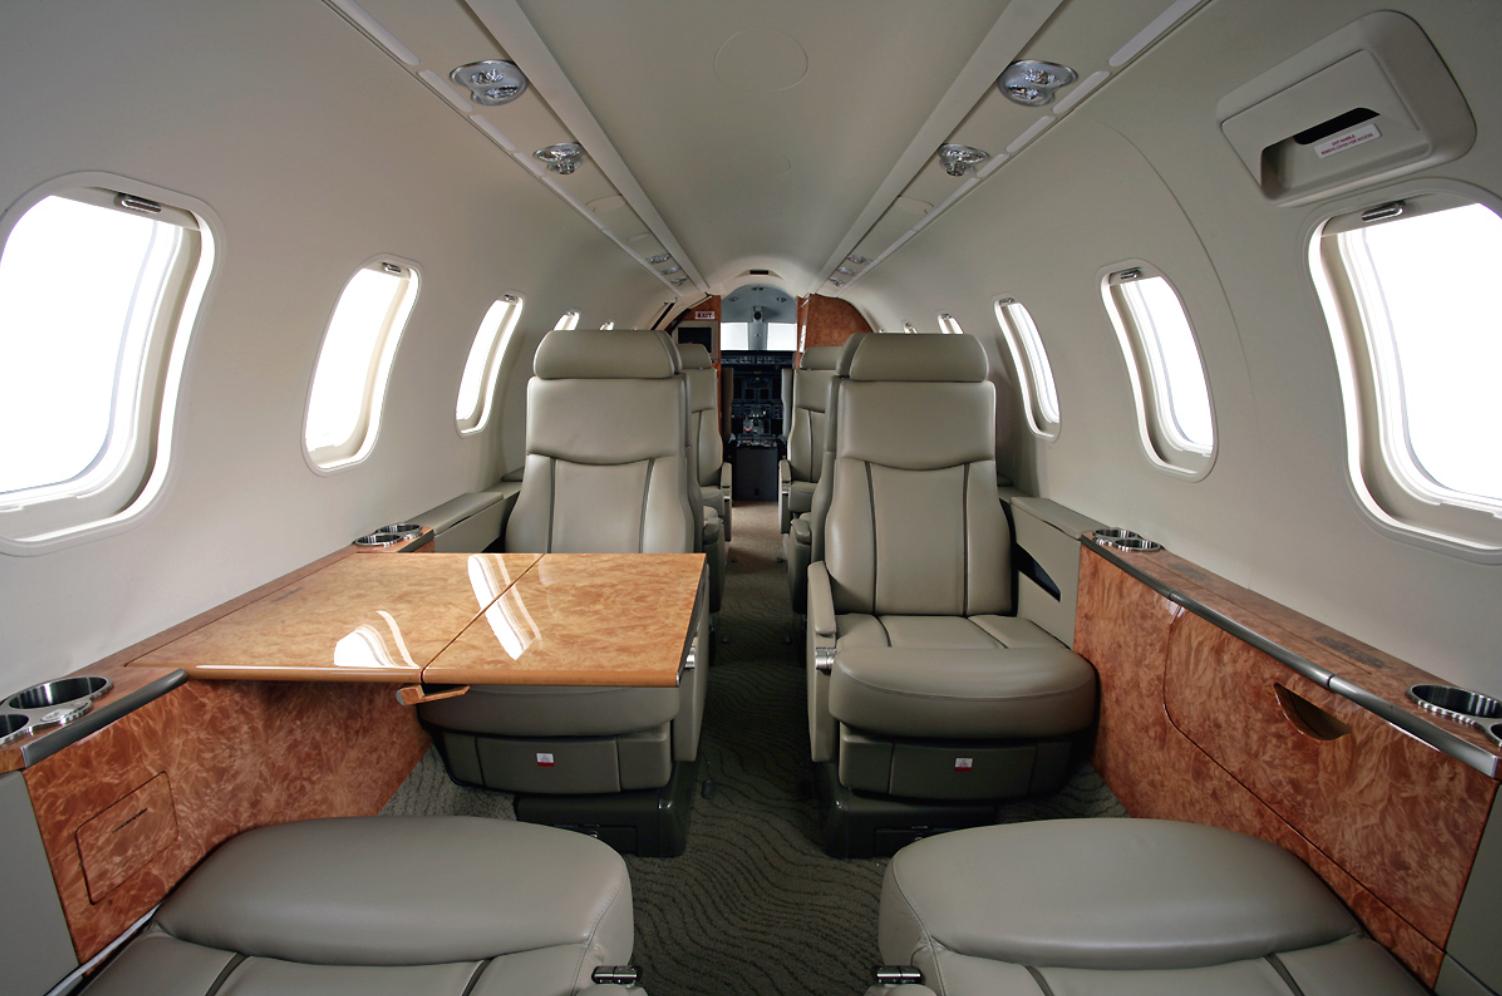 Lear 45 interior